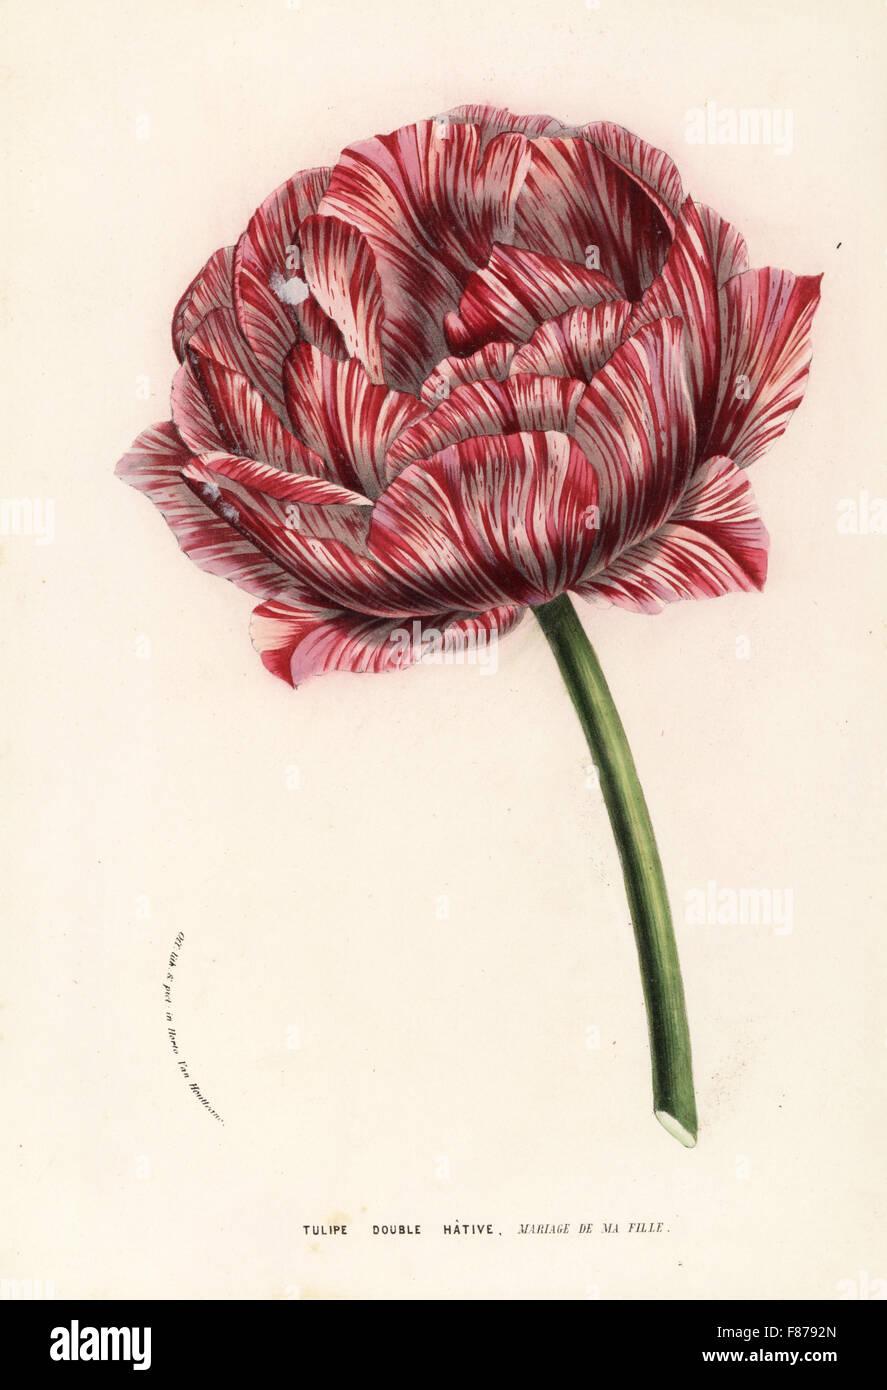 Tulip variety, My Daughter's Wedding, Mariage de ma Fille, tulipe double hative, Tulipa gesneriana. Handcoloured - Stock Image